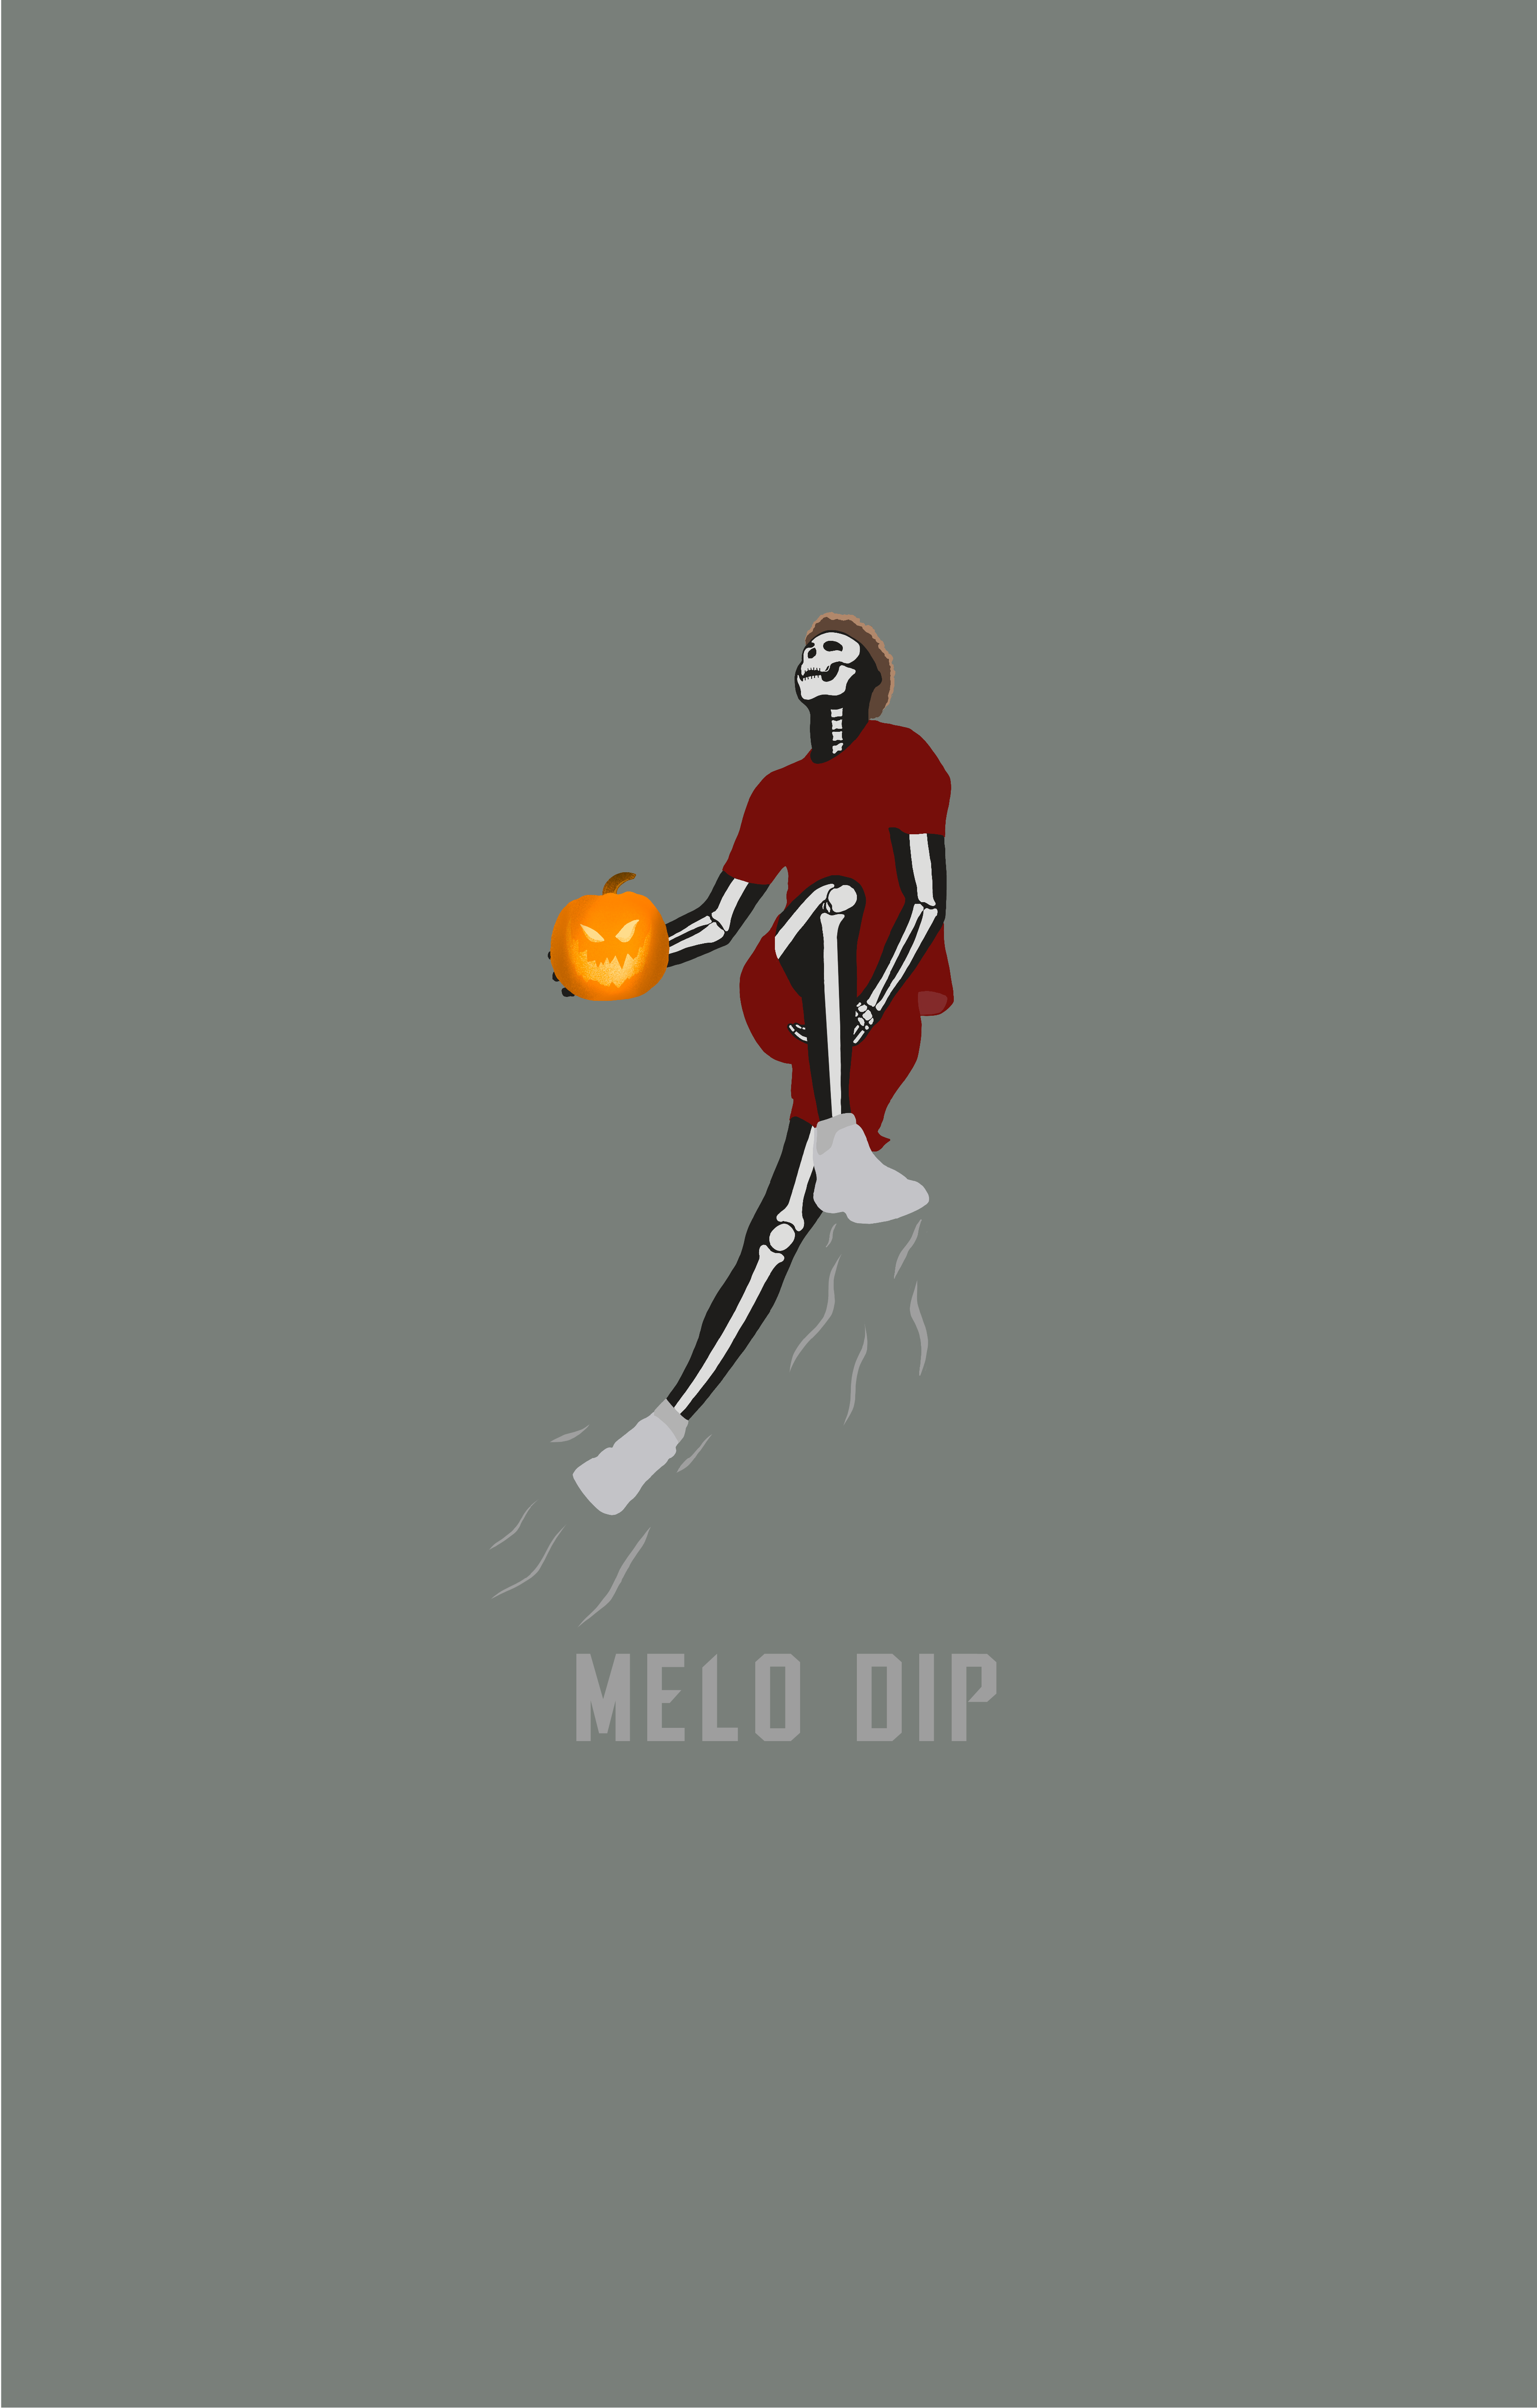 Lamelo Ball Illawarra Hawks Halloween Skeleton Bbb Melo Dip Premium T Shirt By Carco In 2020 Lamelo Ball Jordan Logo Wallpaper Bart Simpson Art